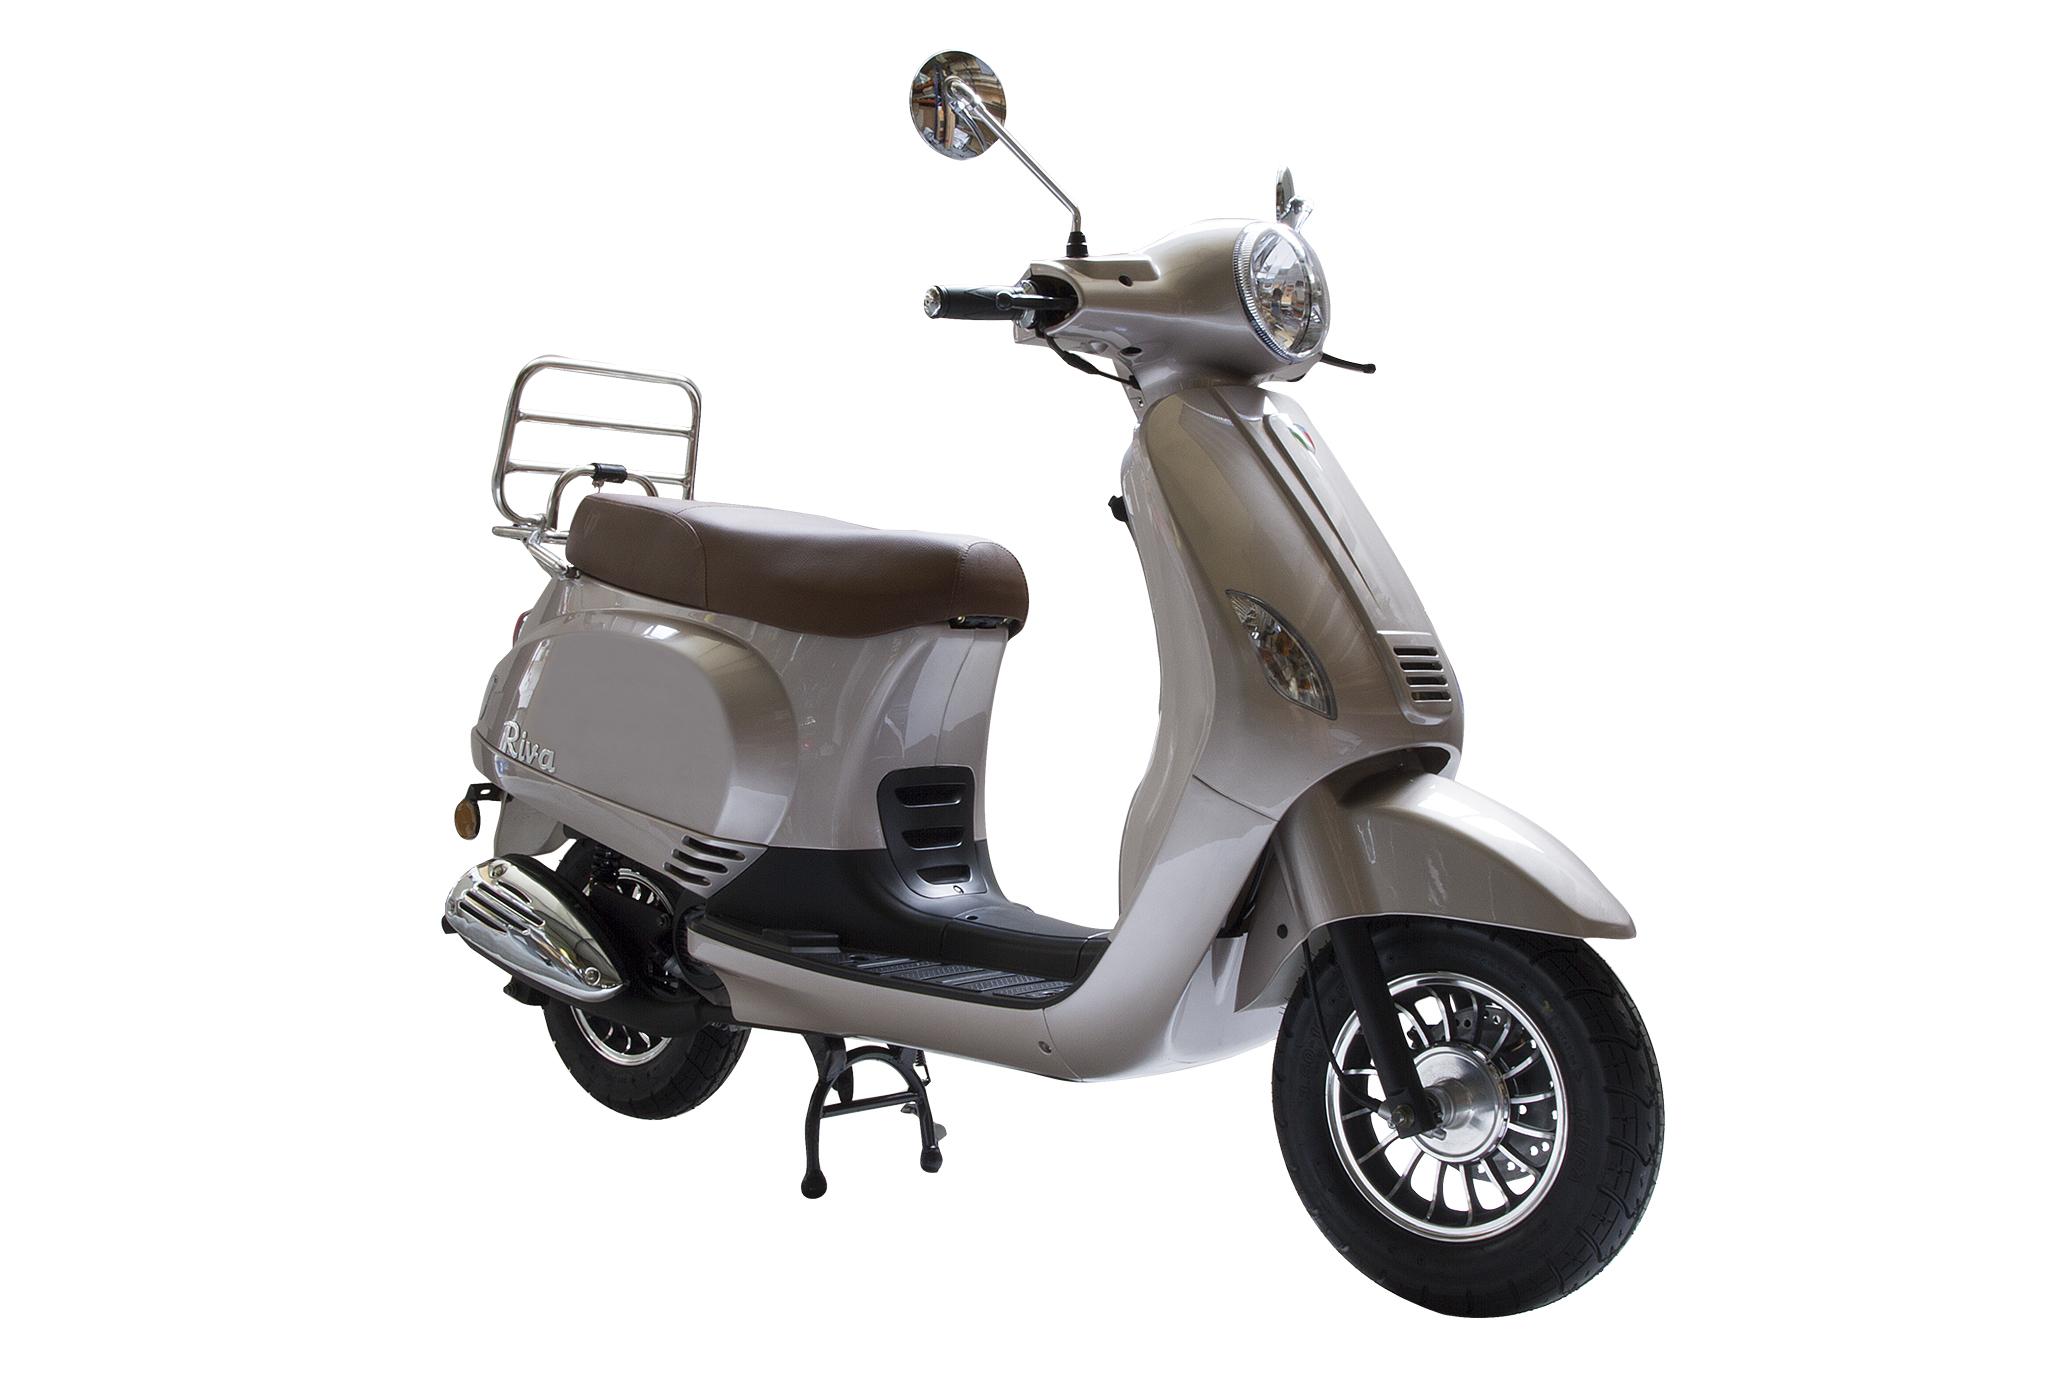 Need Super Pocket Bikes Wiring Diagram Smart Diagrams 110cc Bike Nw Motor Scooters Autos Post Mini